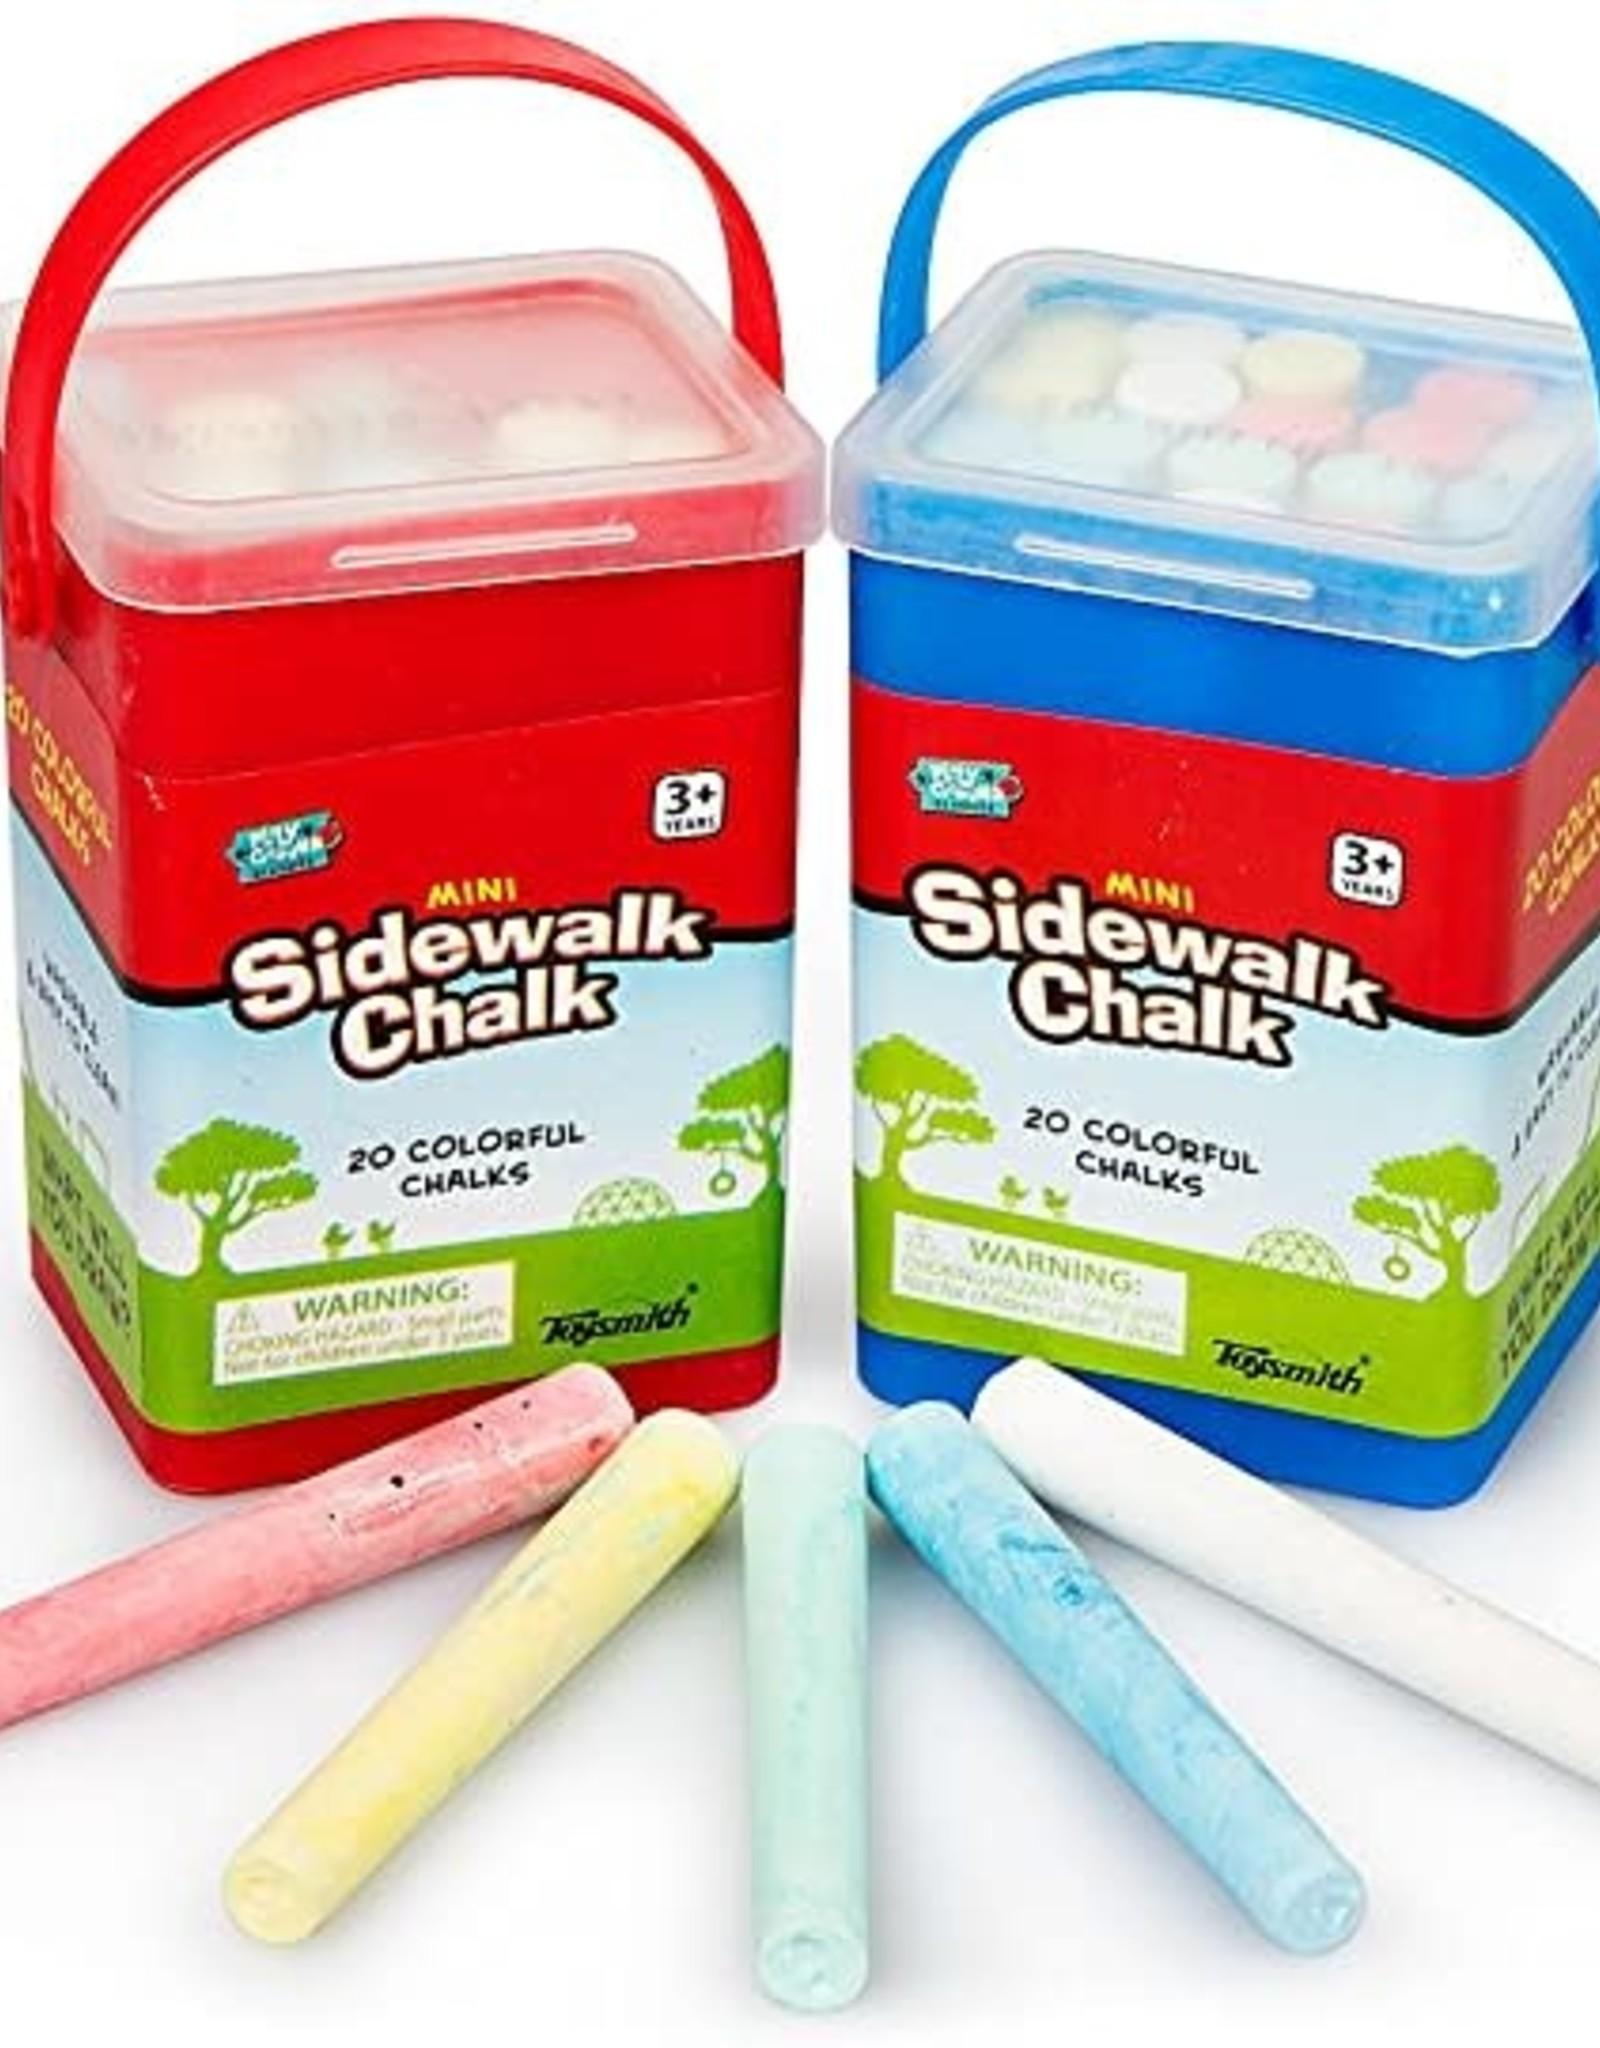 Toysmith Mini Sidewalk Chalk